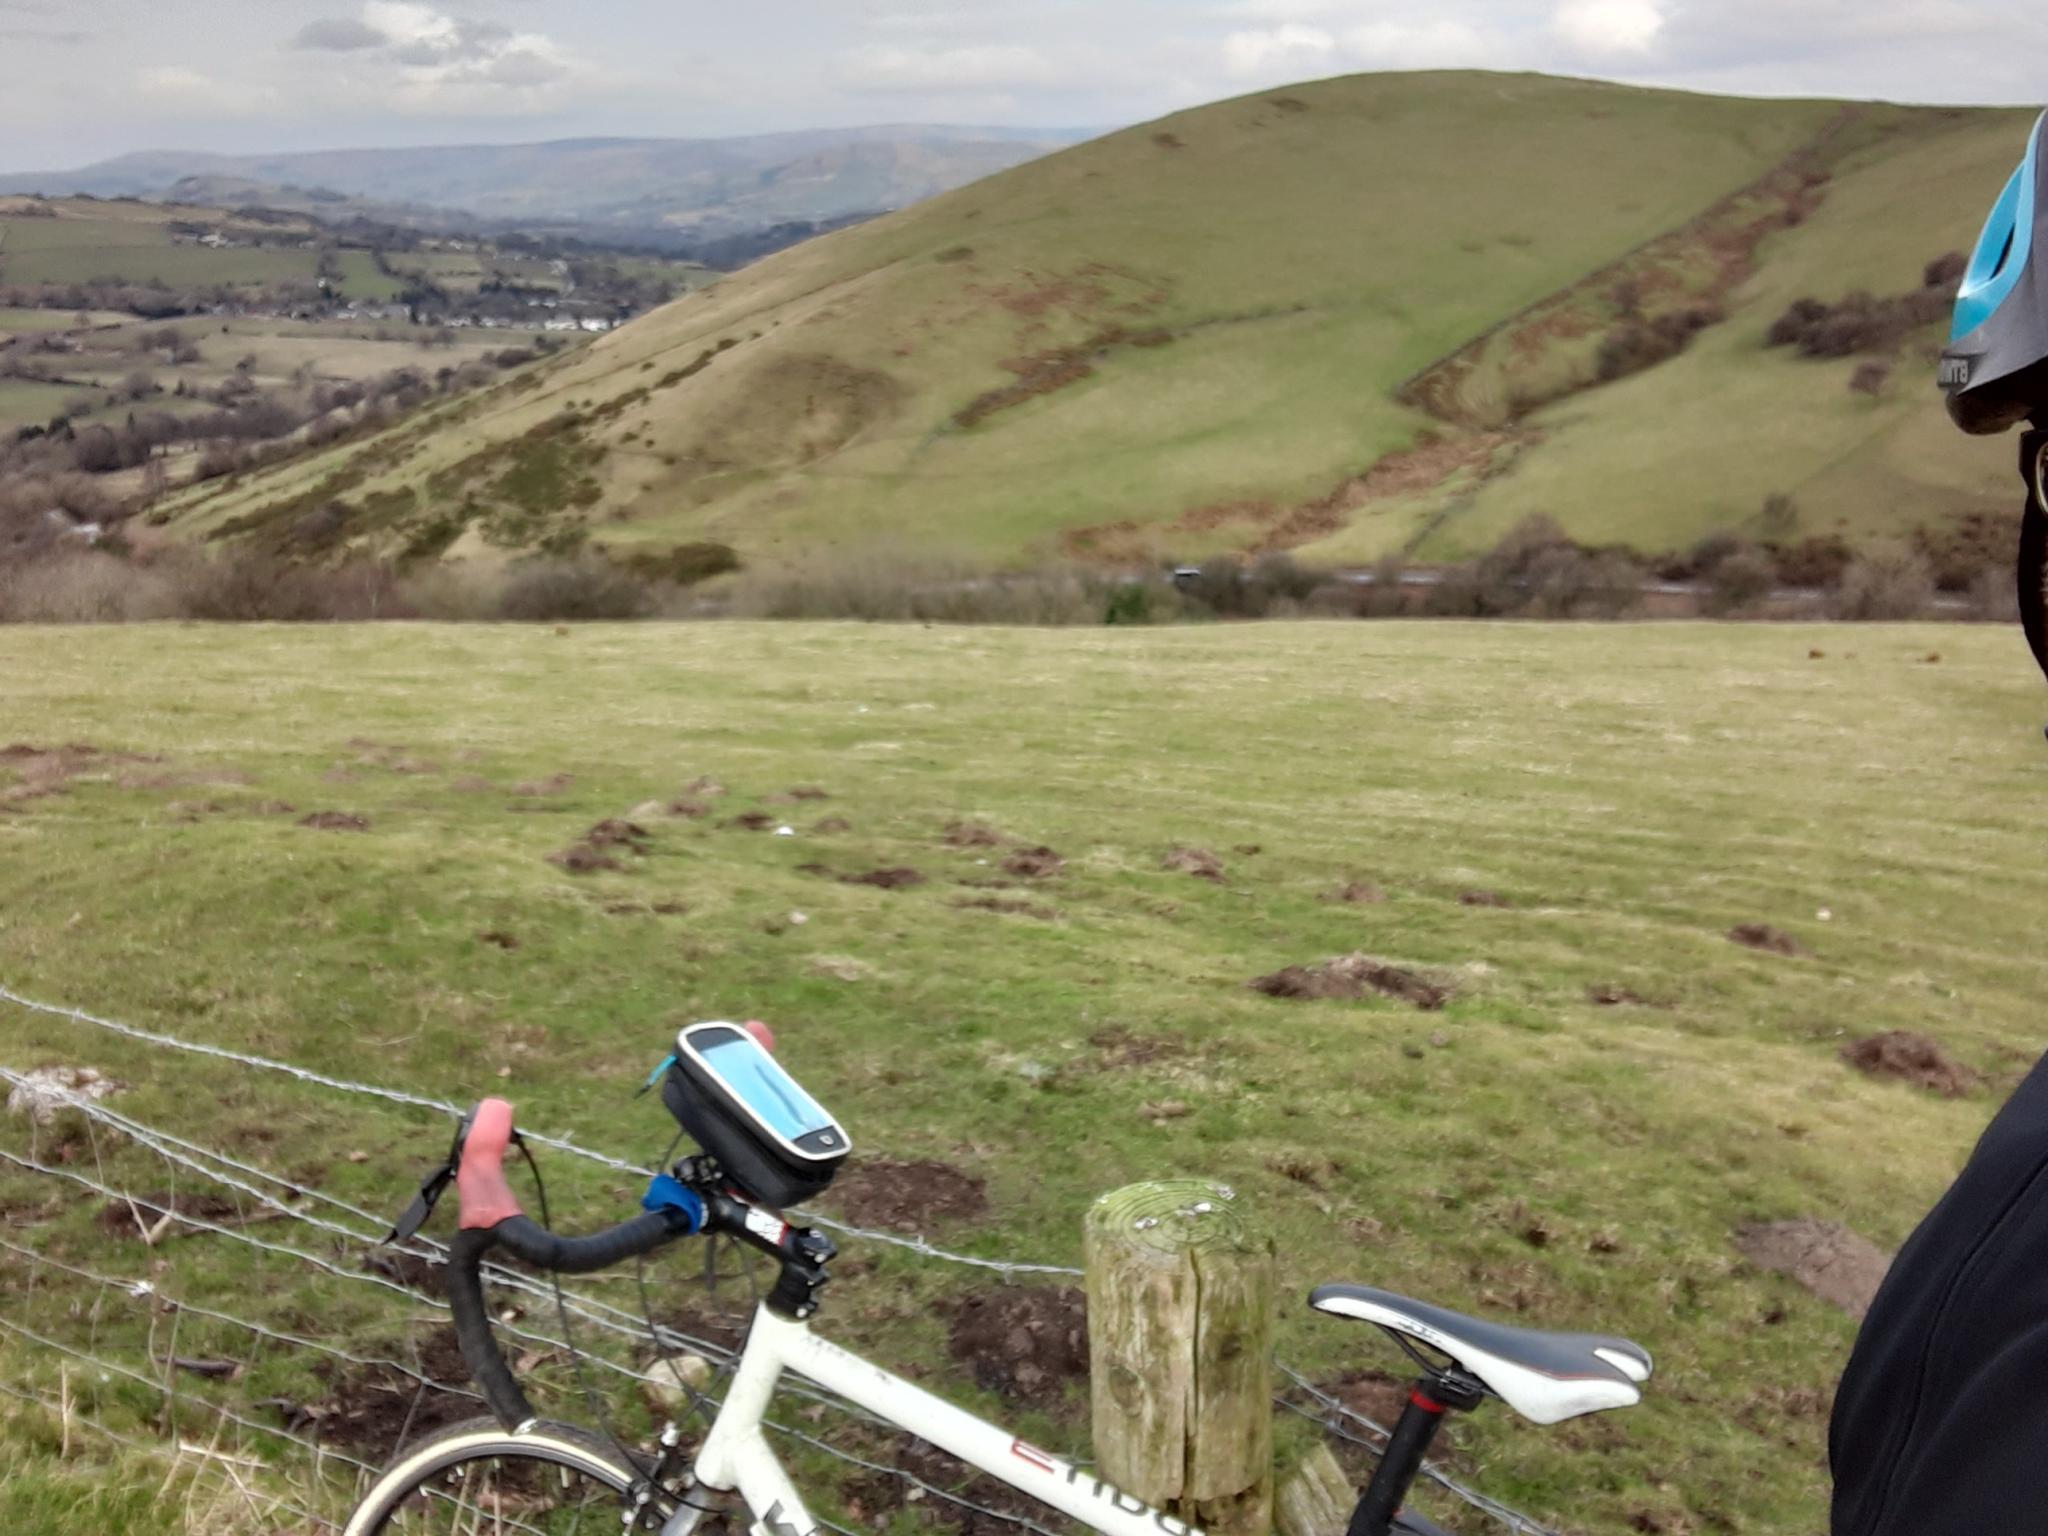 On my bike-20210309_155258-jpg